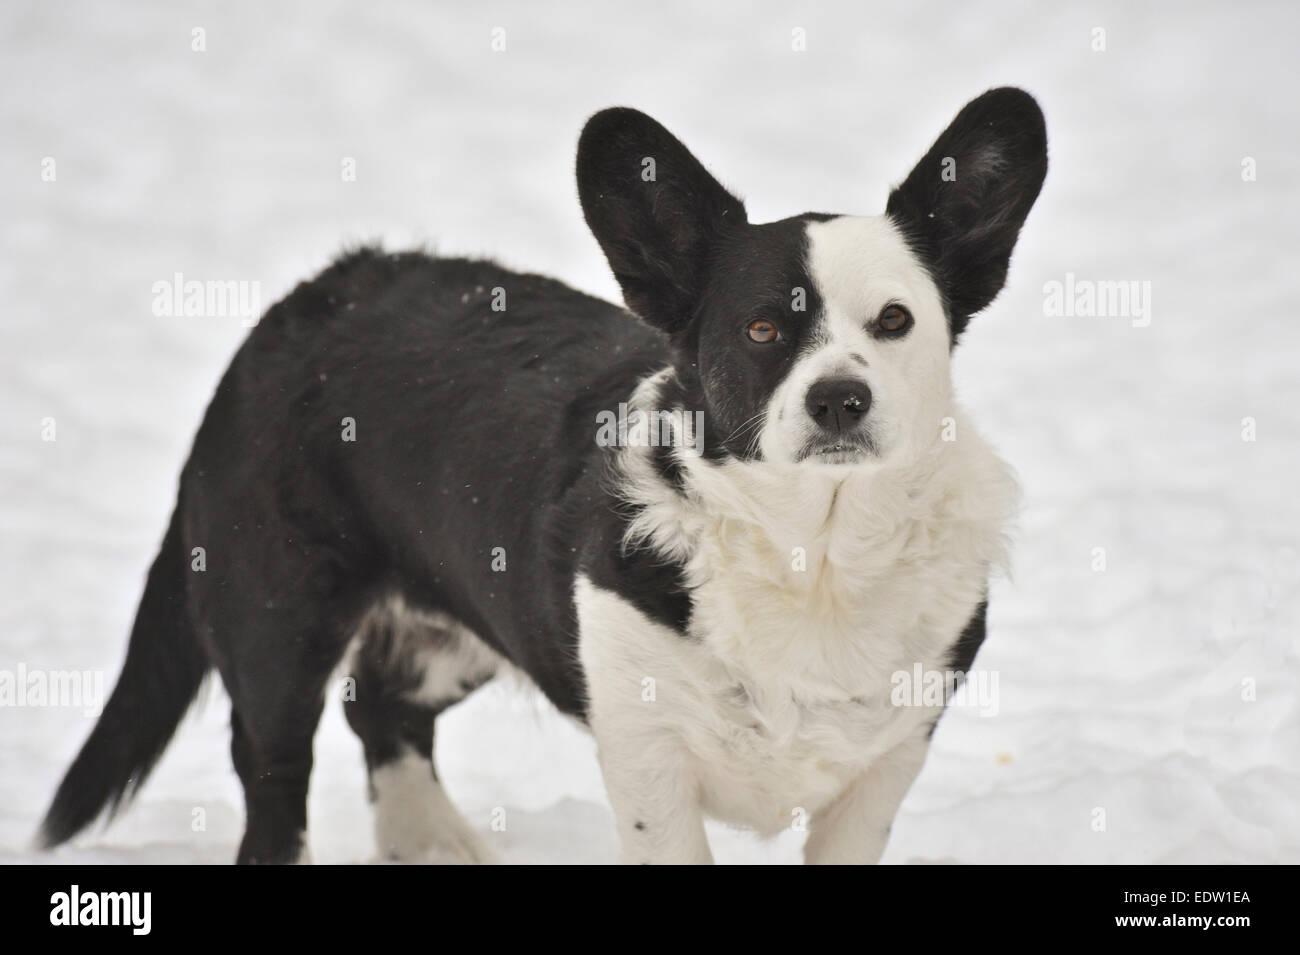 Cardigan welsh corgi in snow - Stock Image